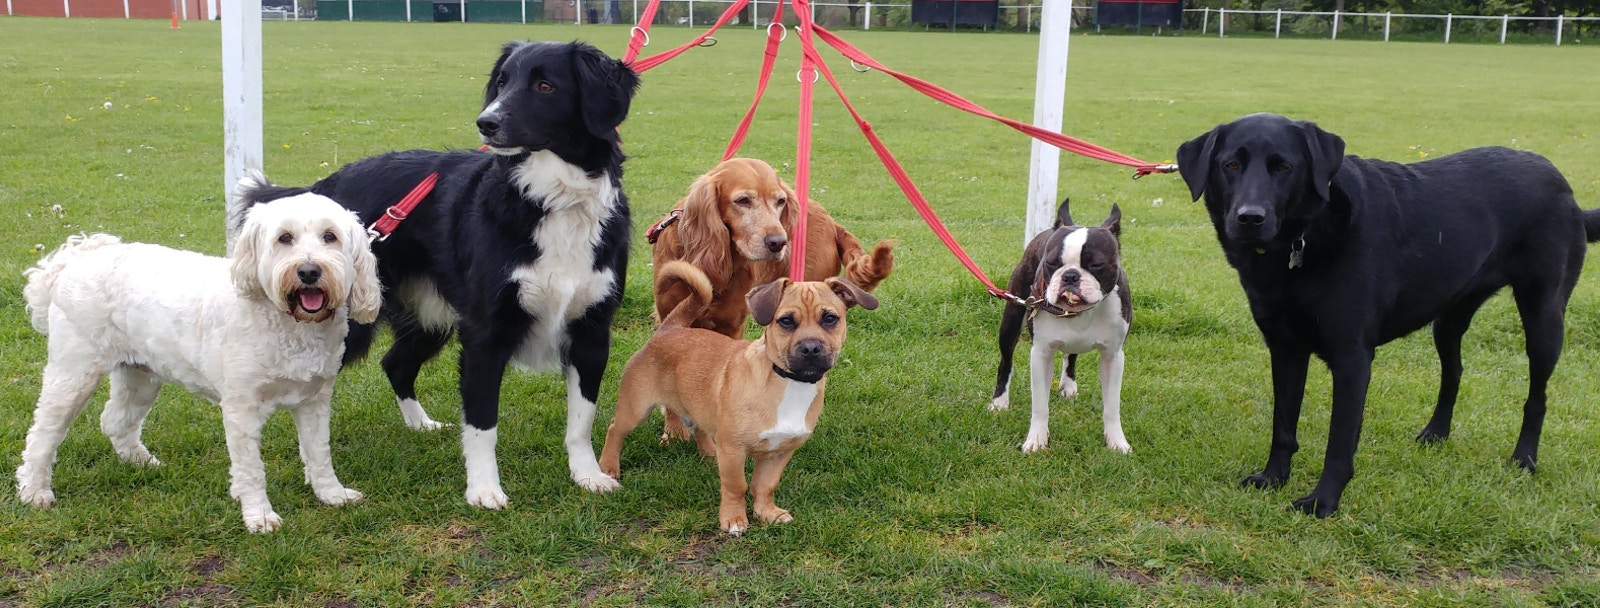 dog daycare header